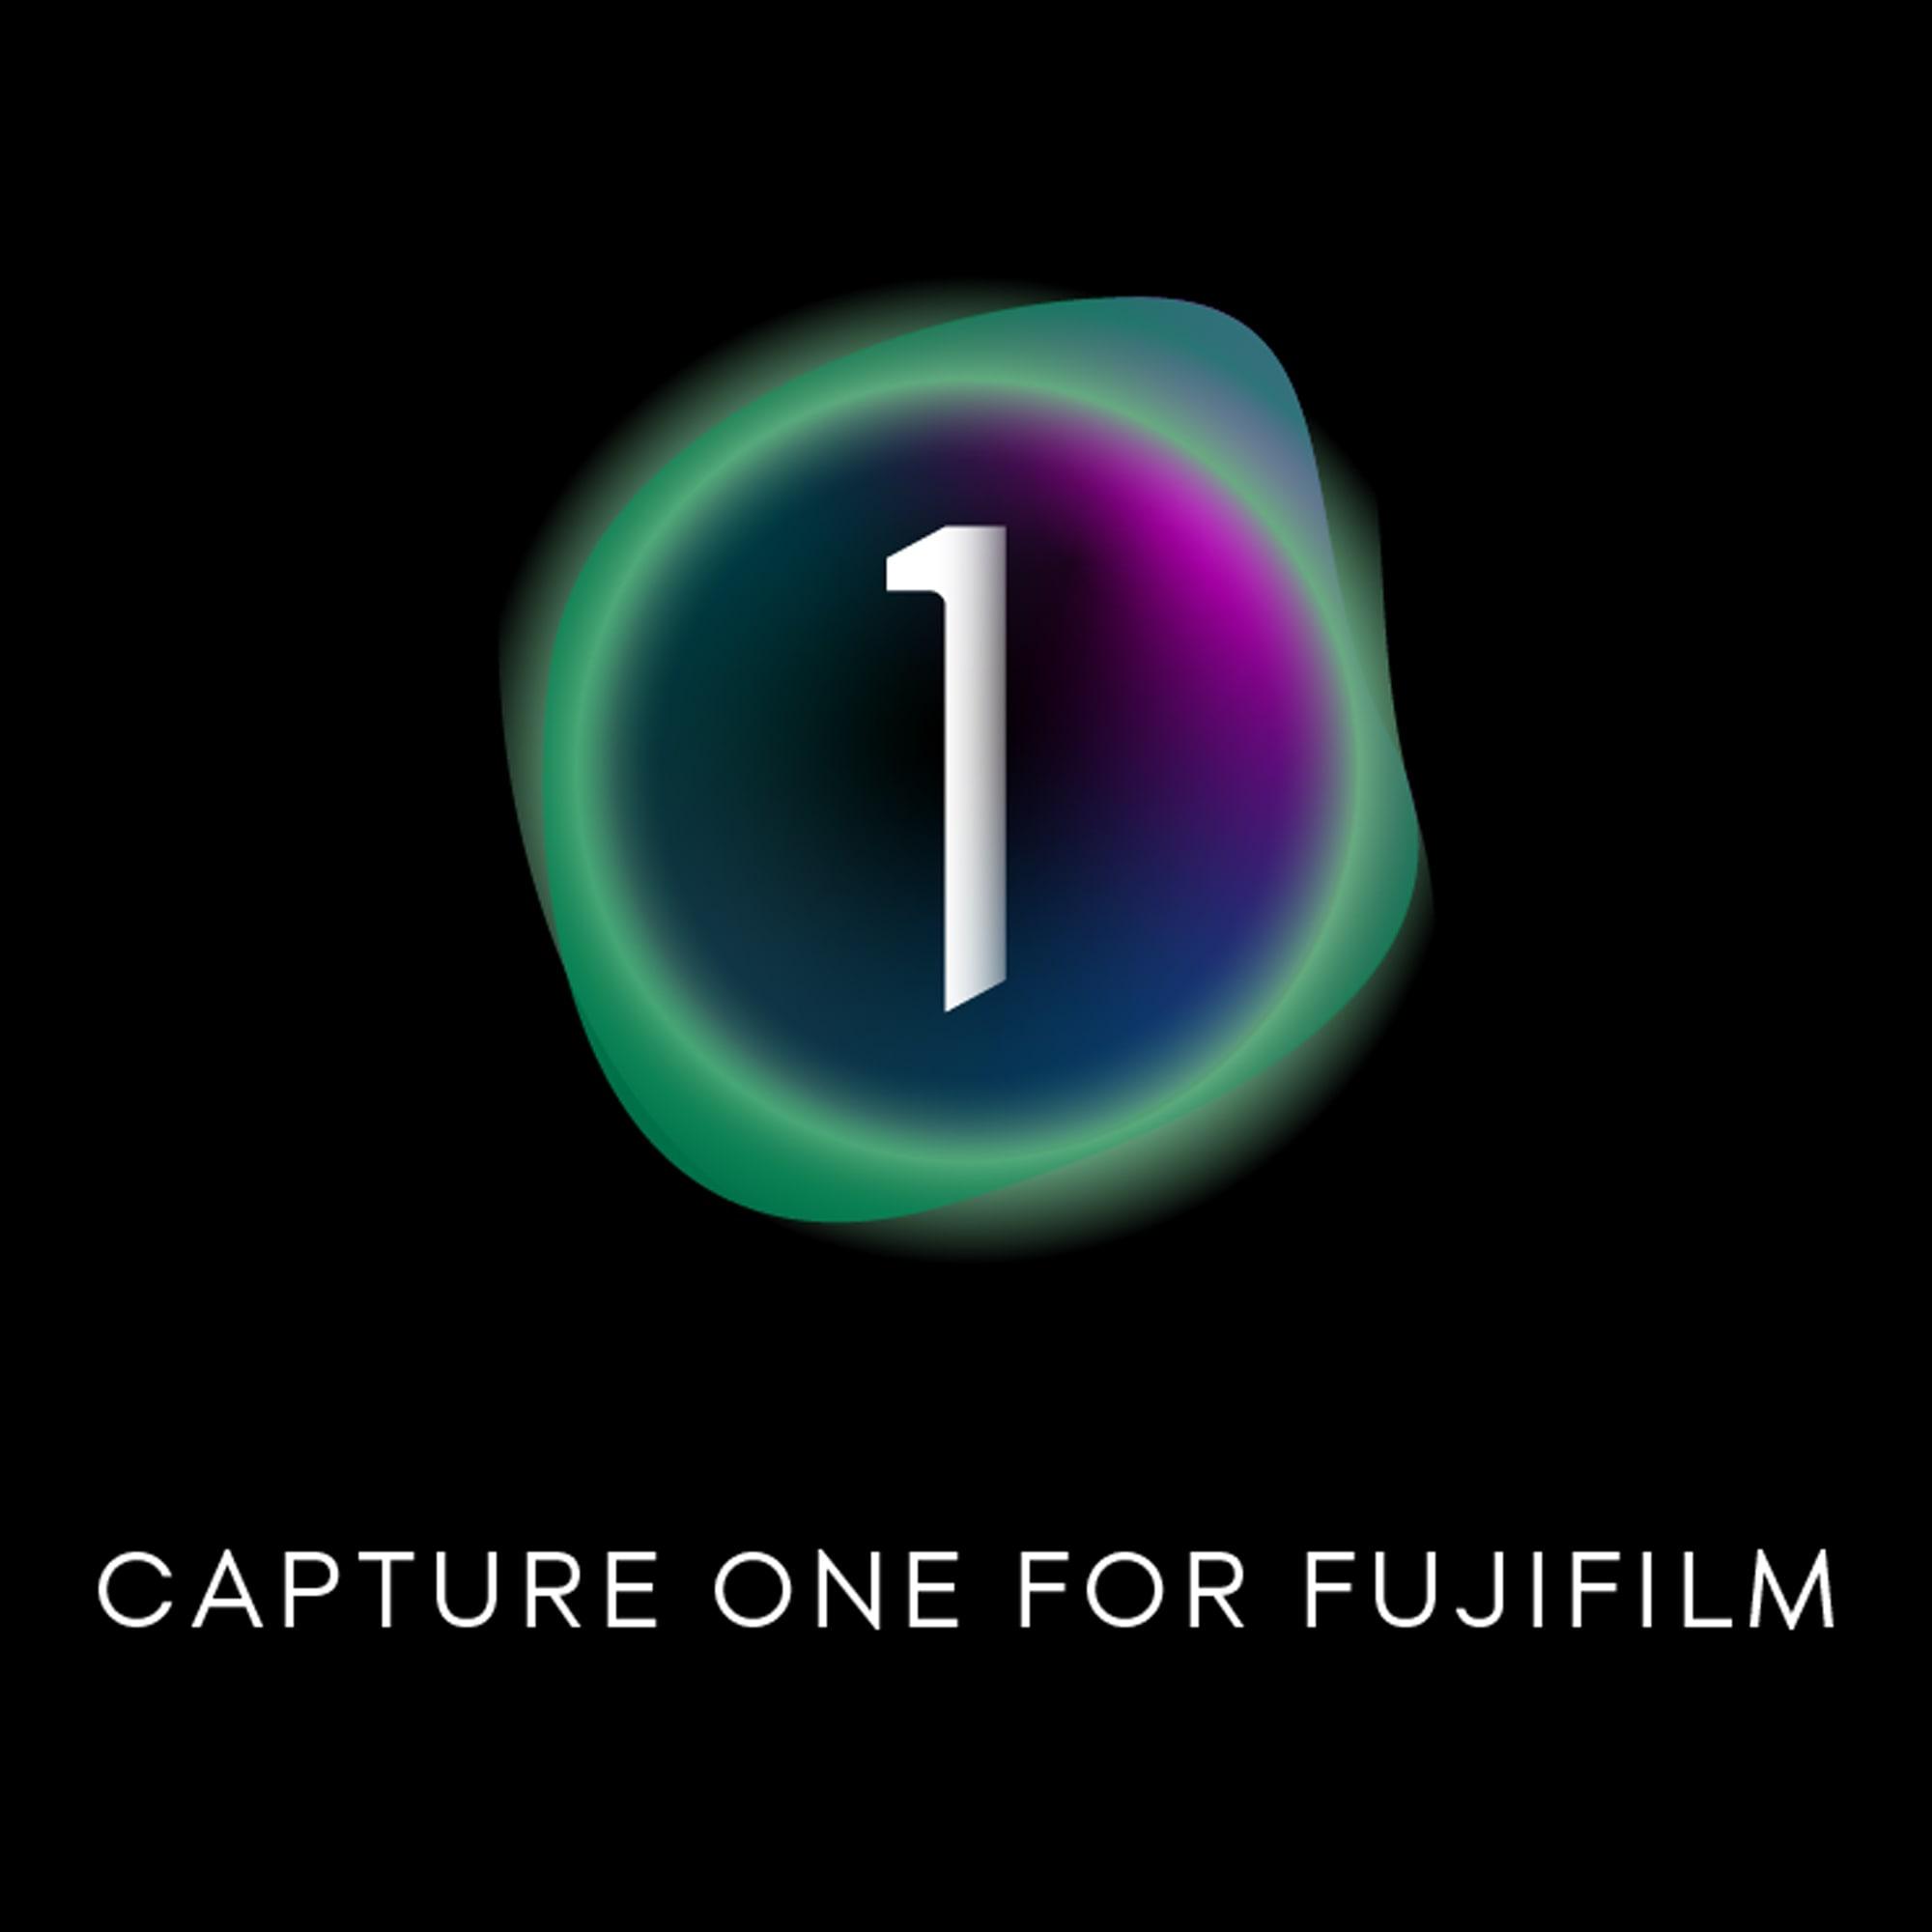 Capture One Pro 20 Till Fujifilm